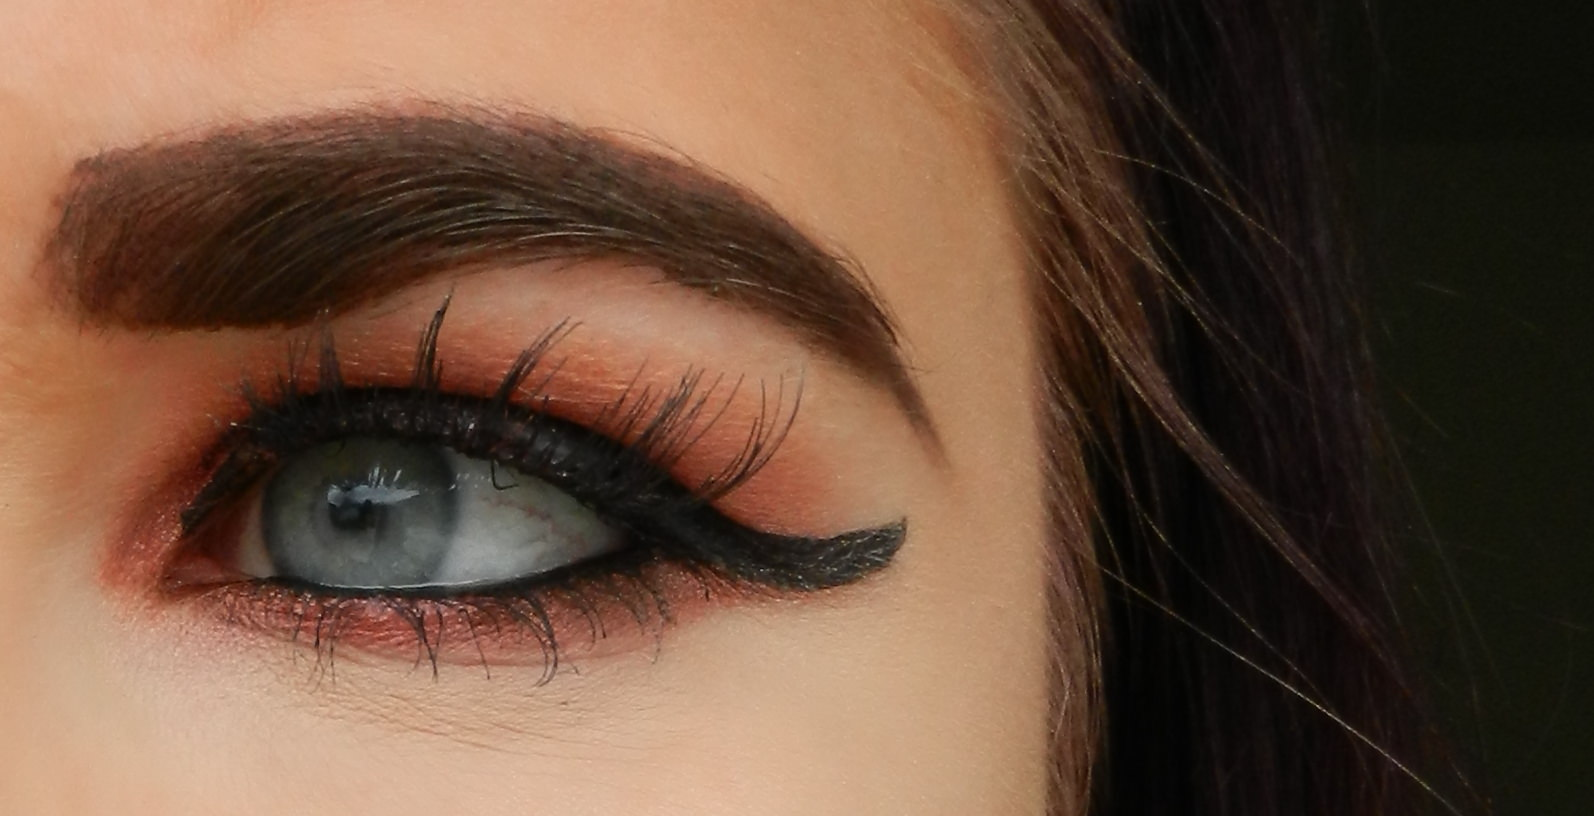 Urban Decay Afterdark Supersonic Eyeshadow Makeup look